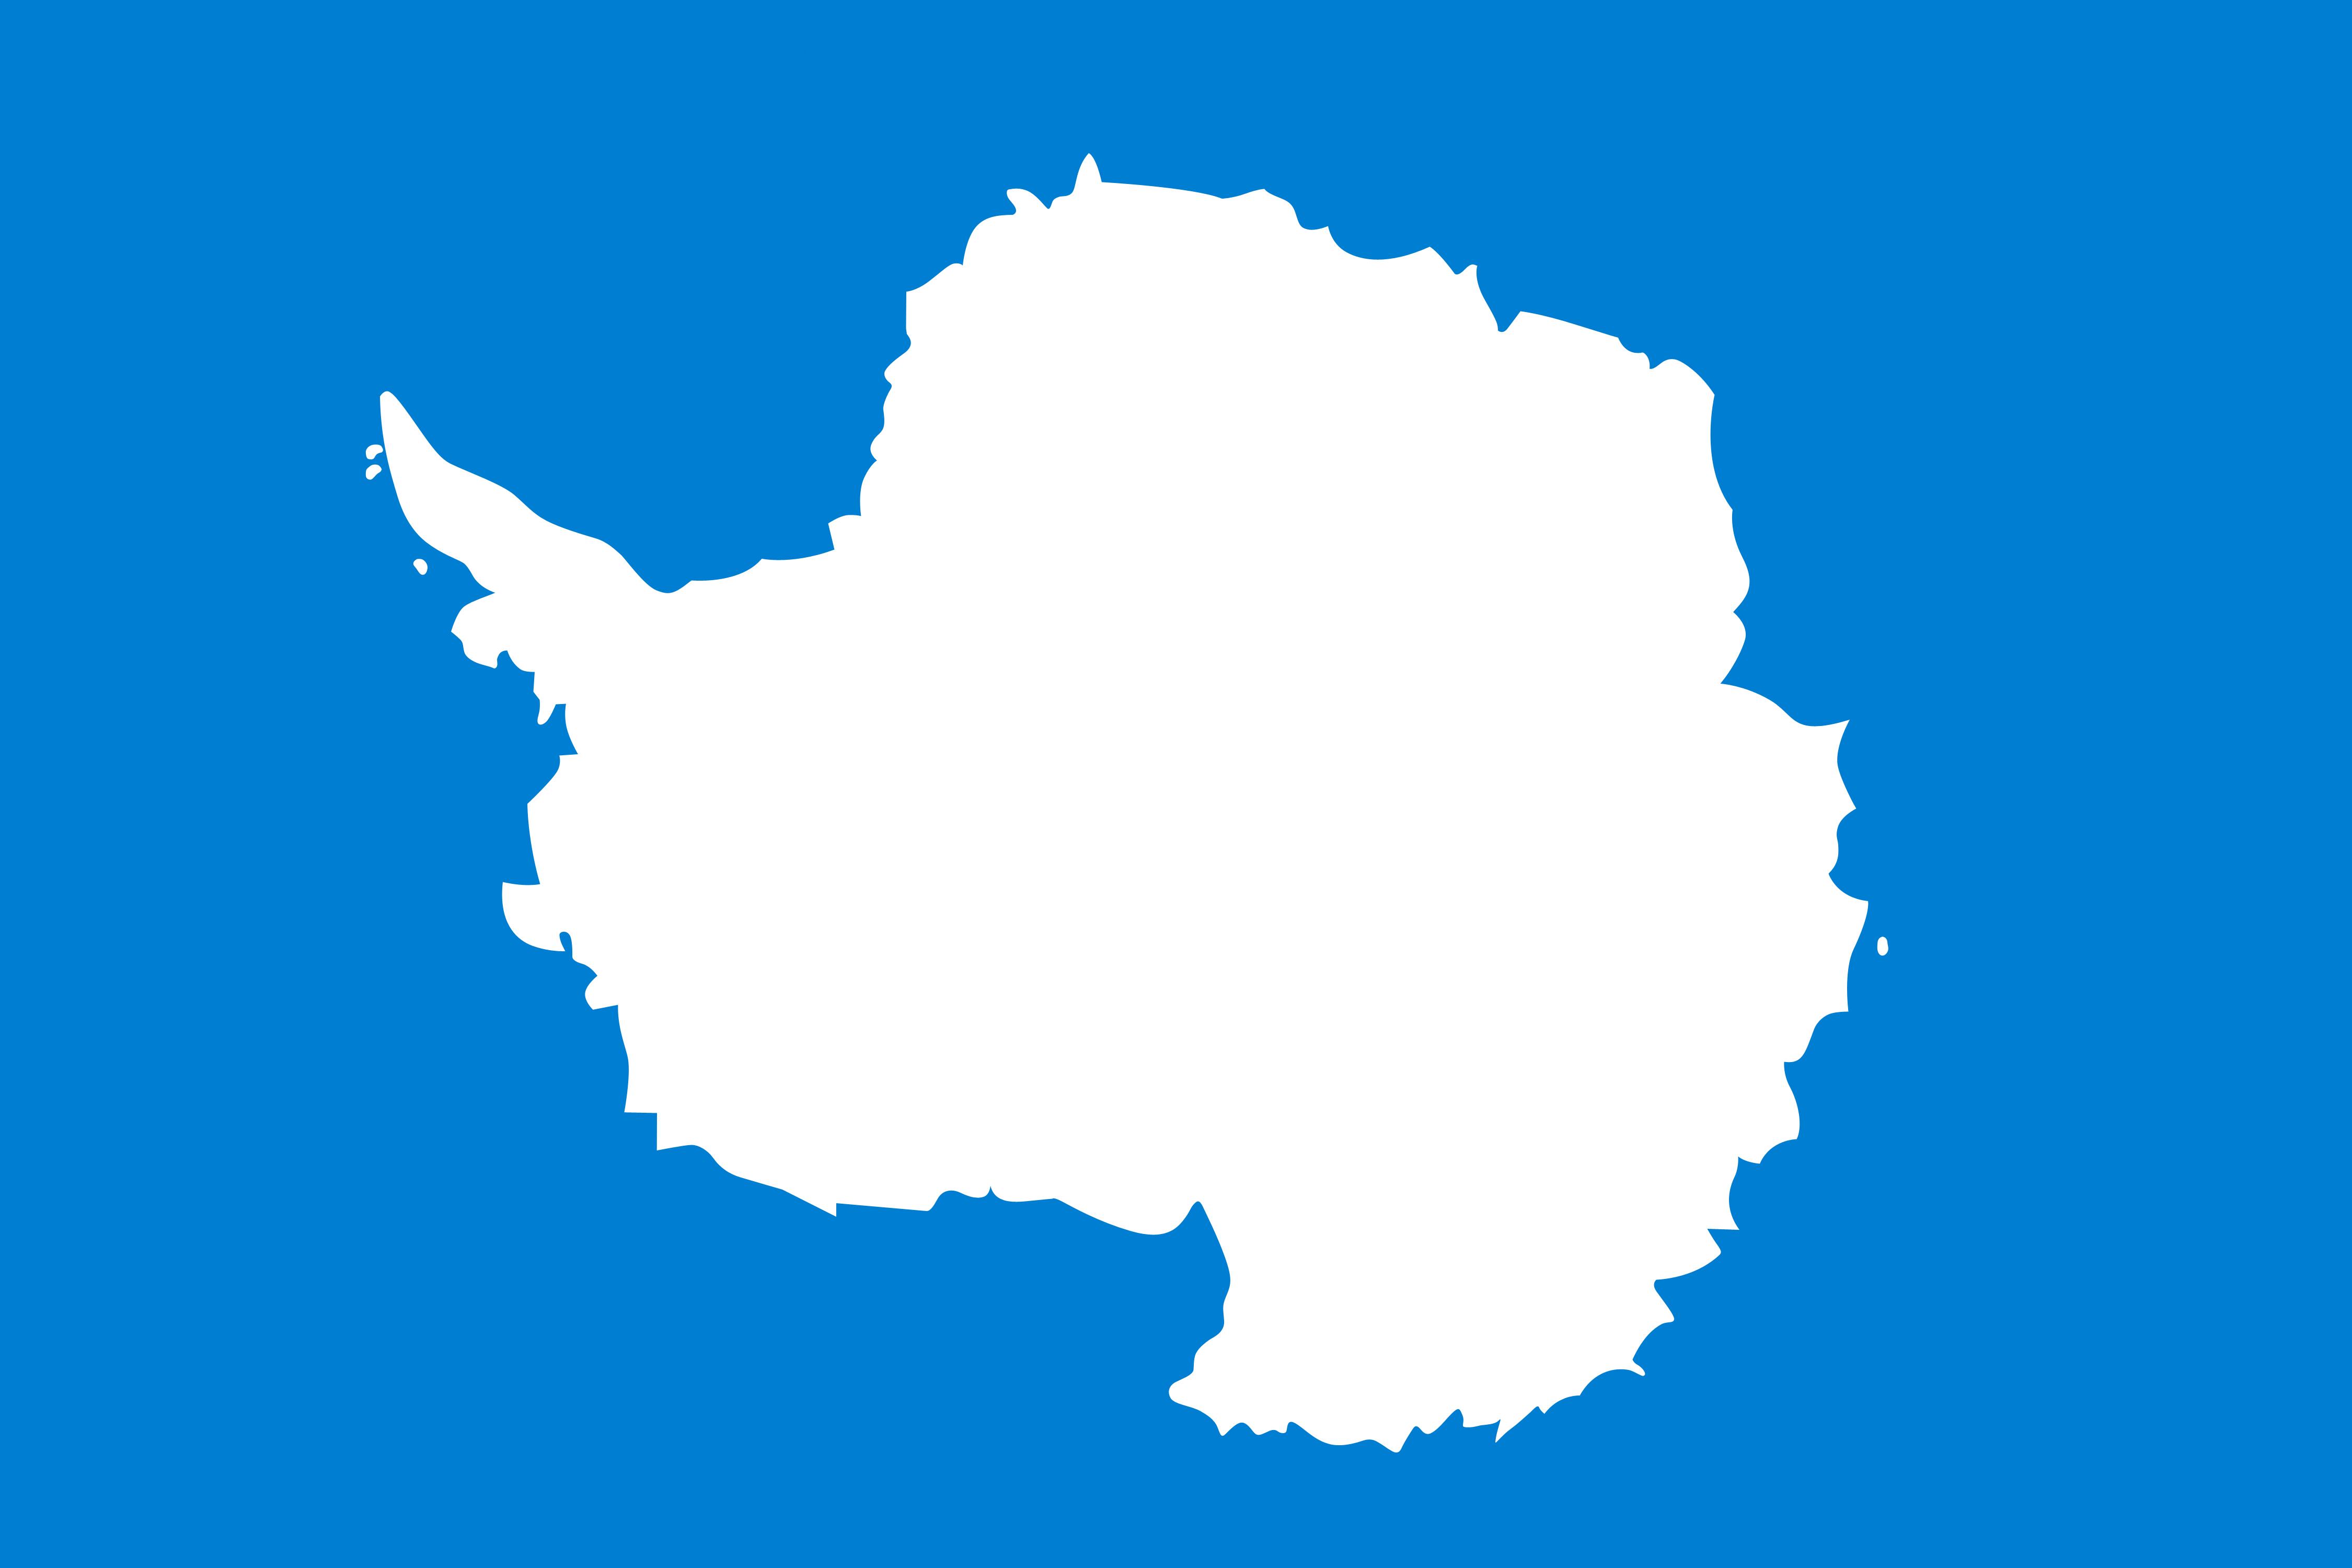 Wallpapers Antarctica Flag 4500x3000 4500x3000